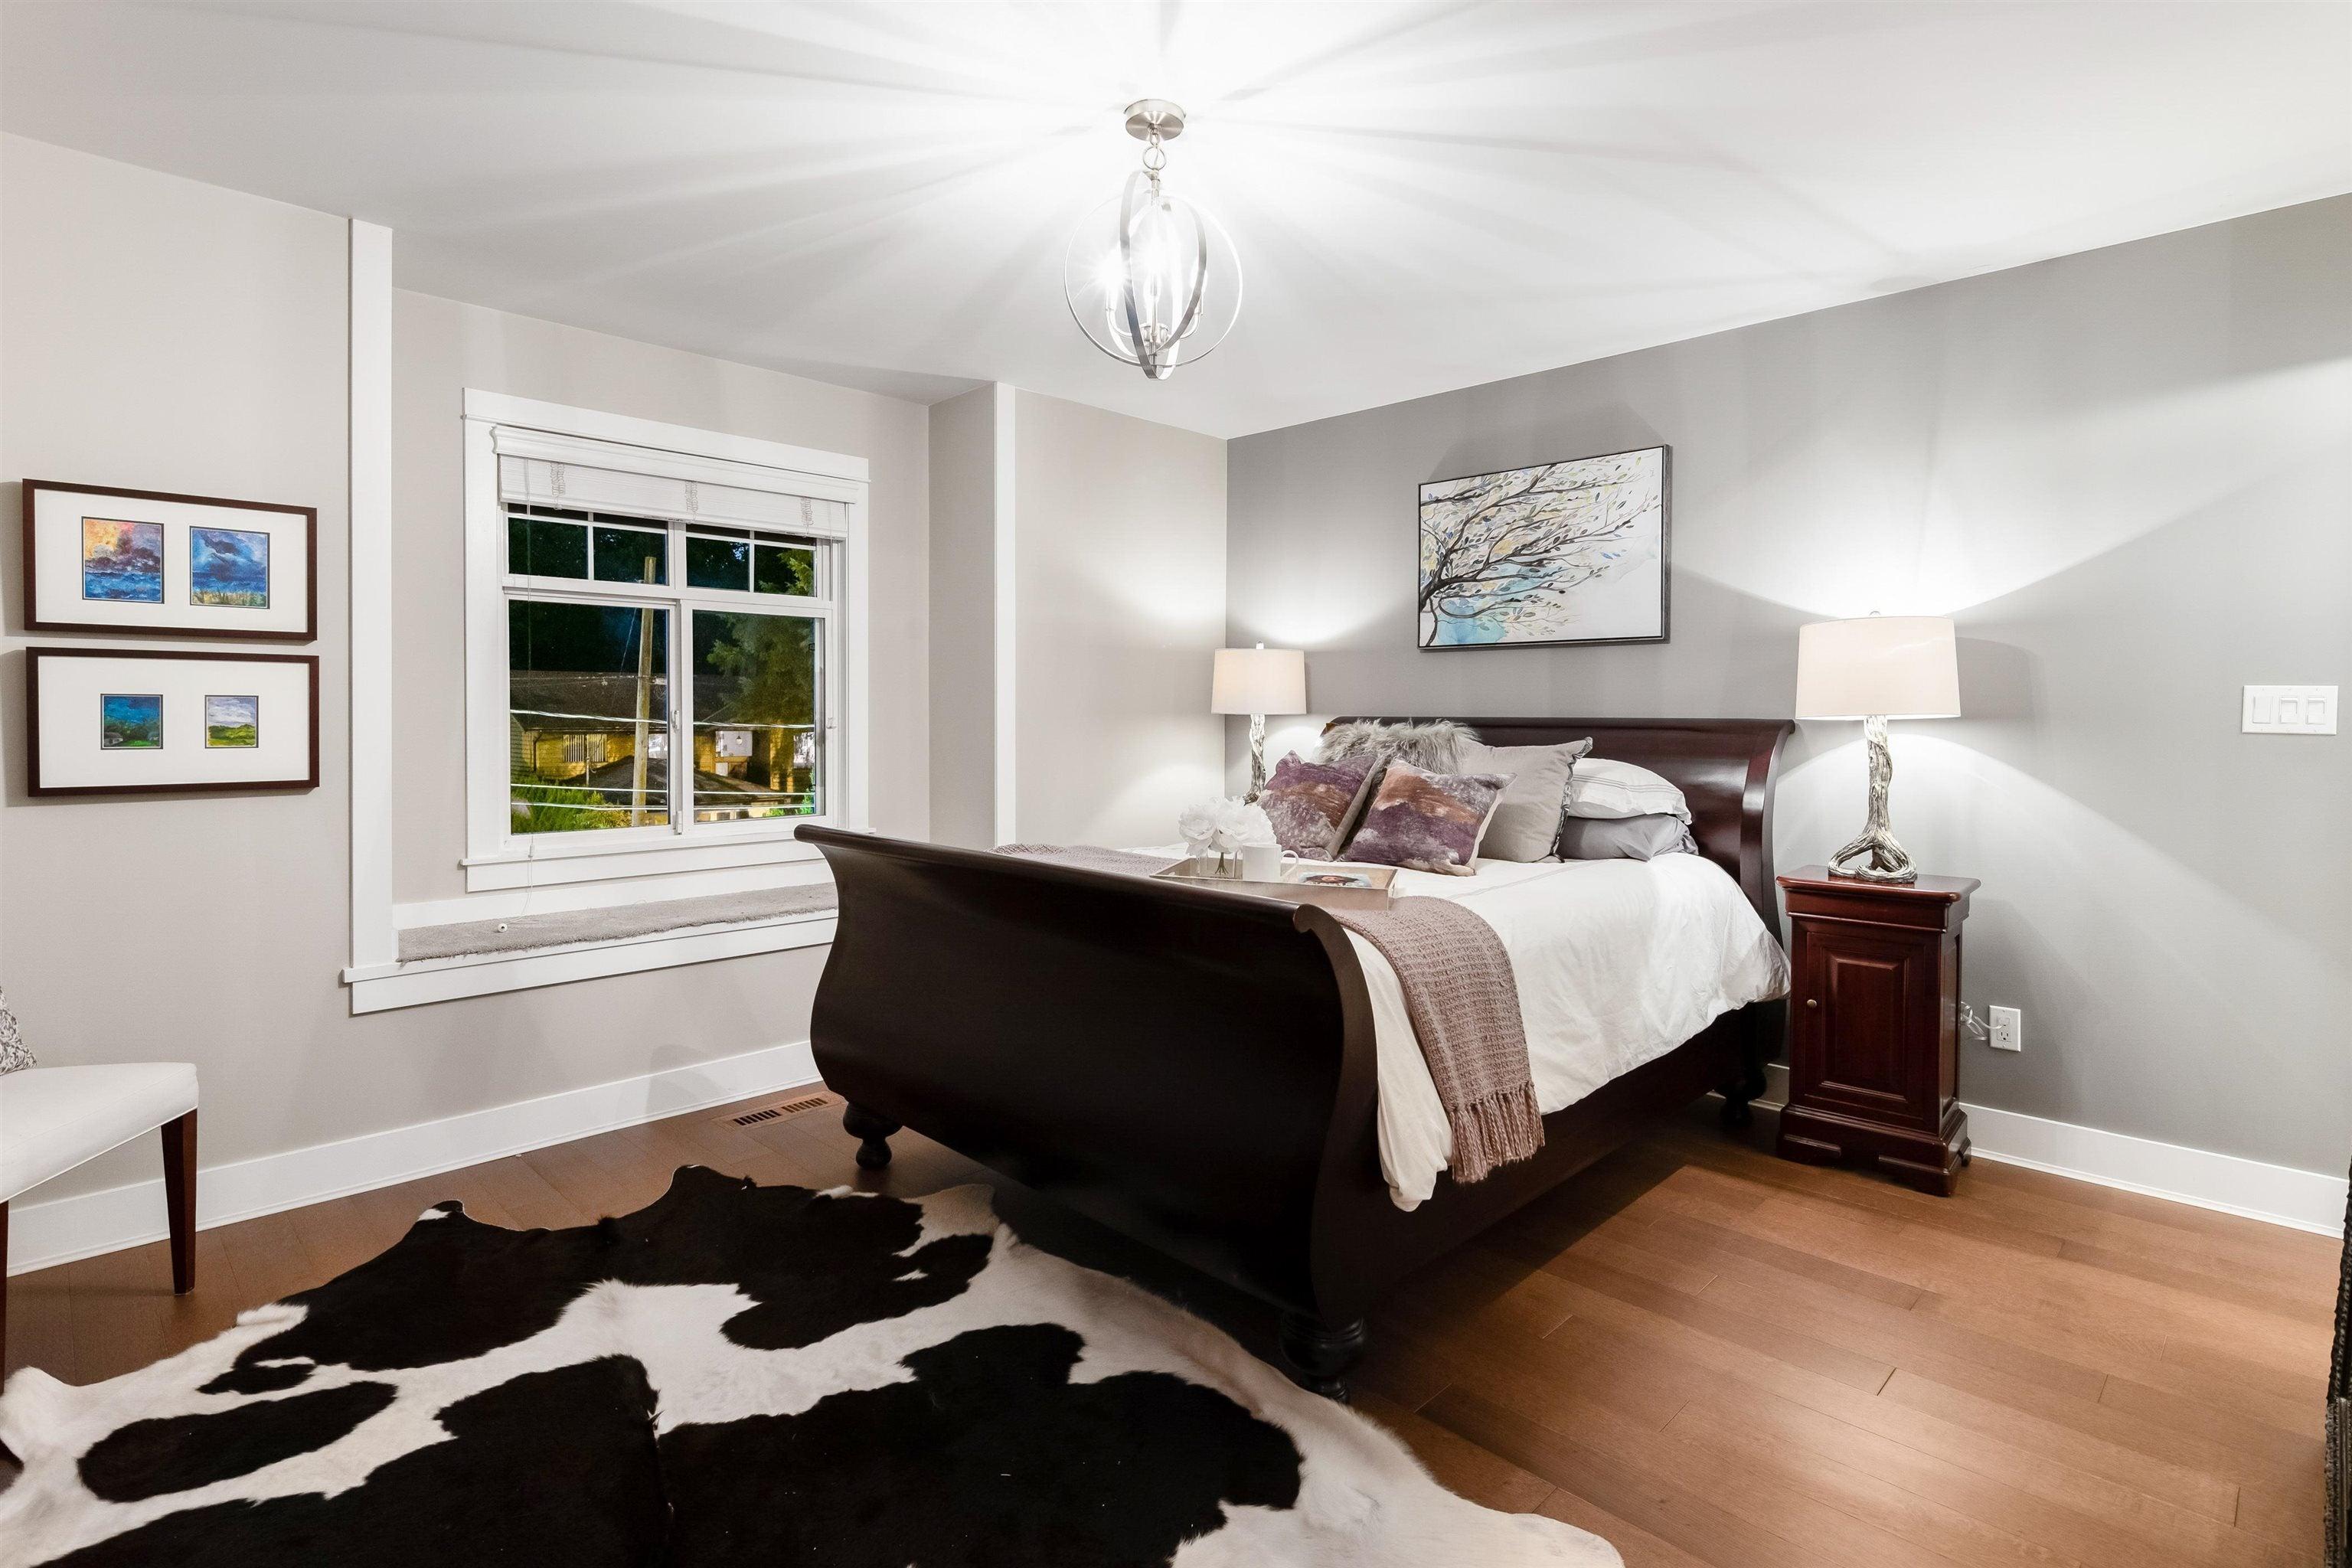 2258 WINDRIDGE DRIVE - Seymour NV House/Single Family for sale, 5 Bedrooms (R2617156) - #22